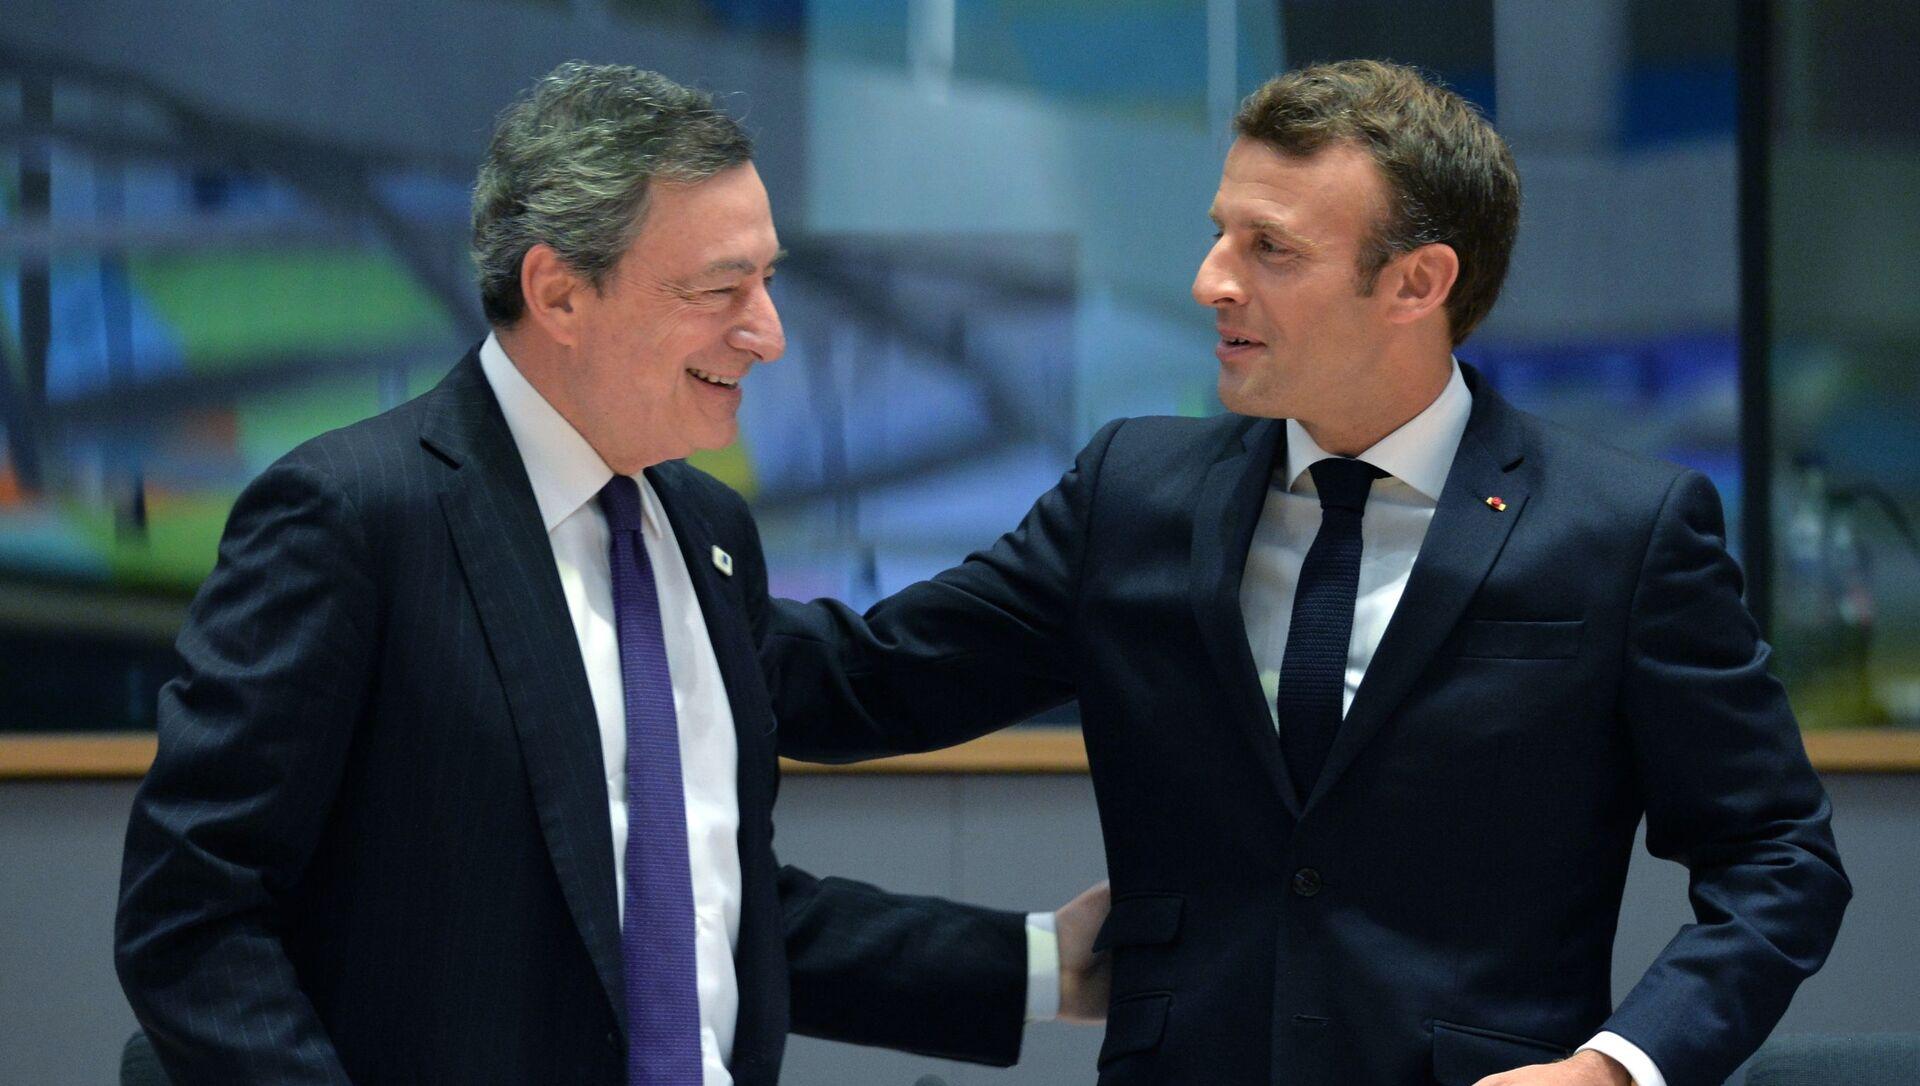 Mario Draghi e Emmanuel Macron - Sputnik Italia, 1920, 21.04.2021